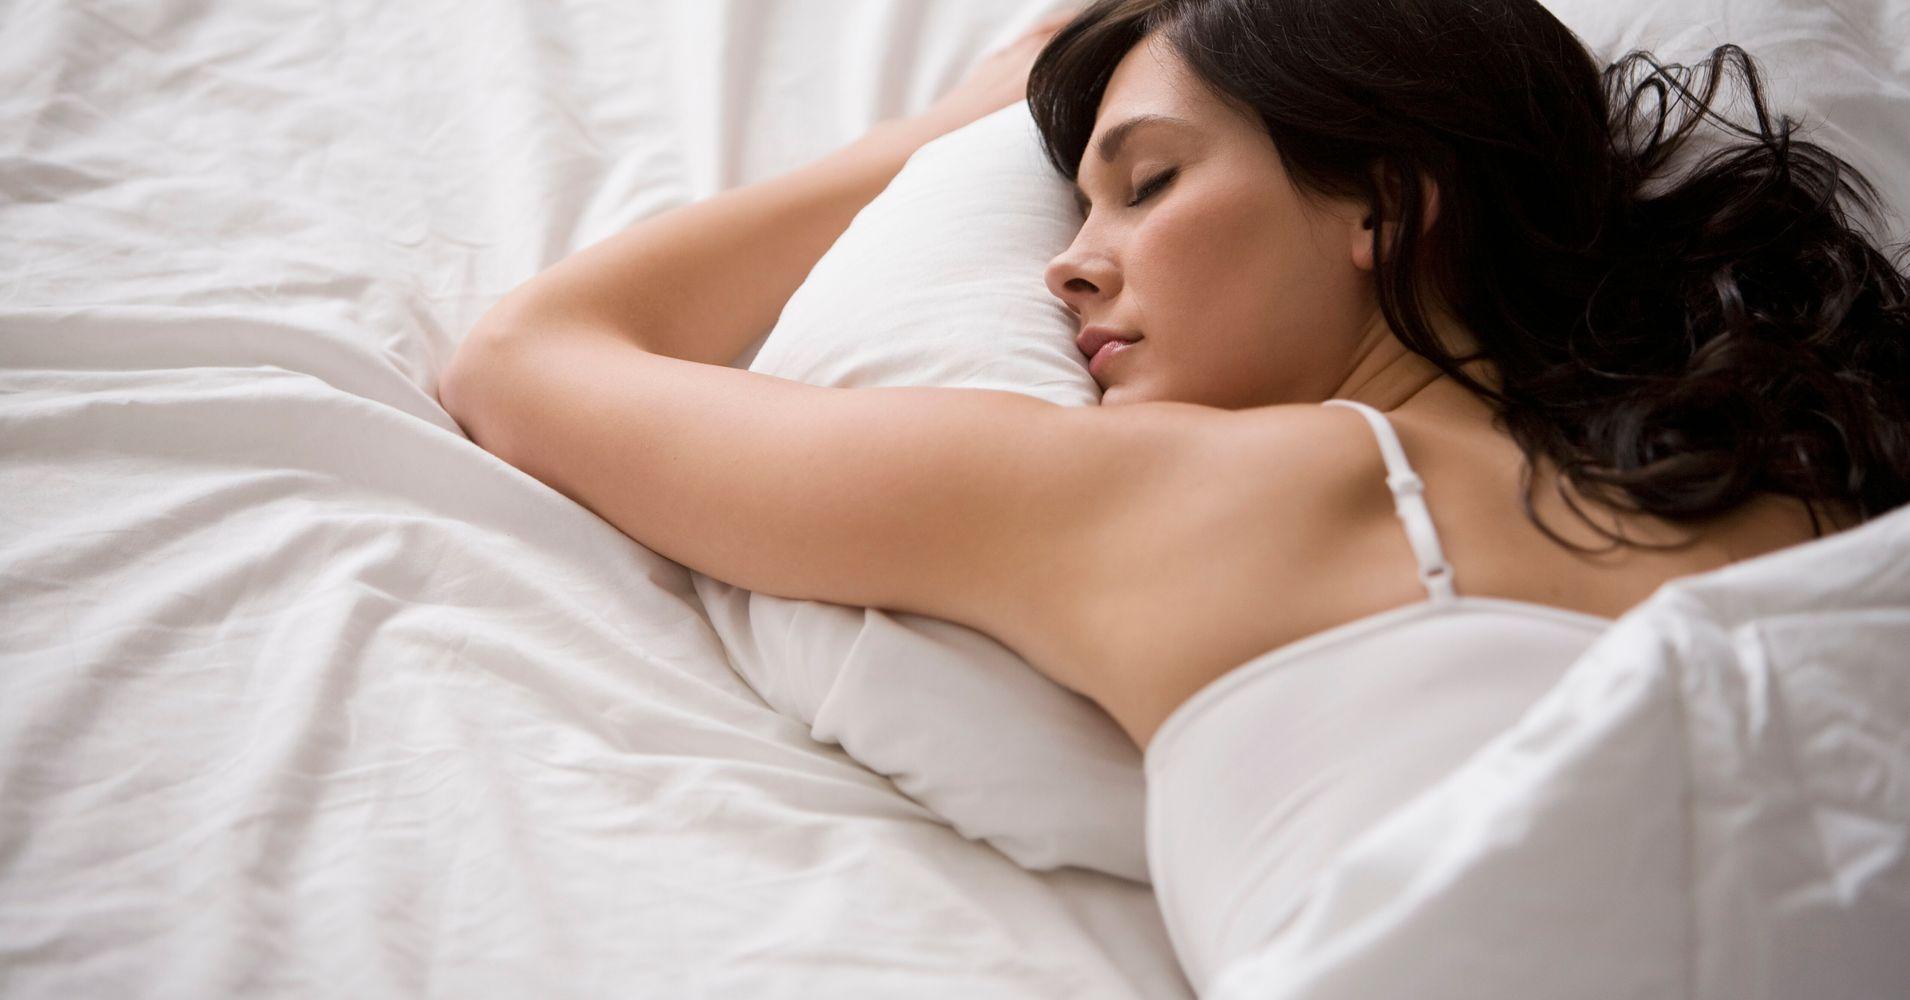 Review: Leesa's Hybrid Pillow Lets Me Sleep Through The Night Pain-Free